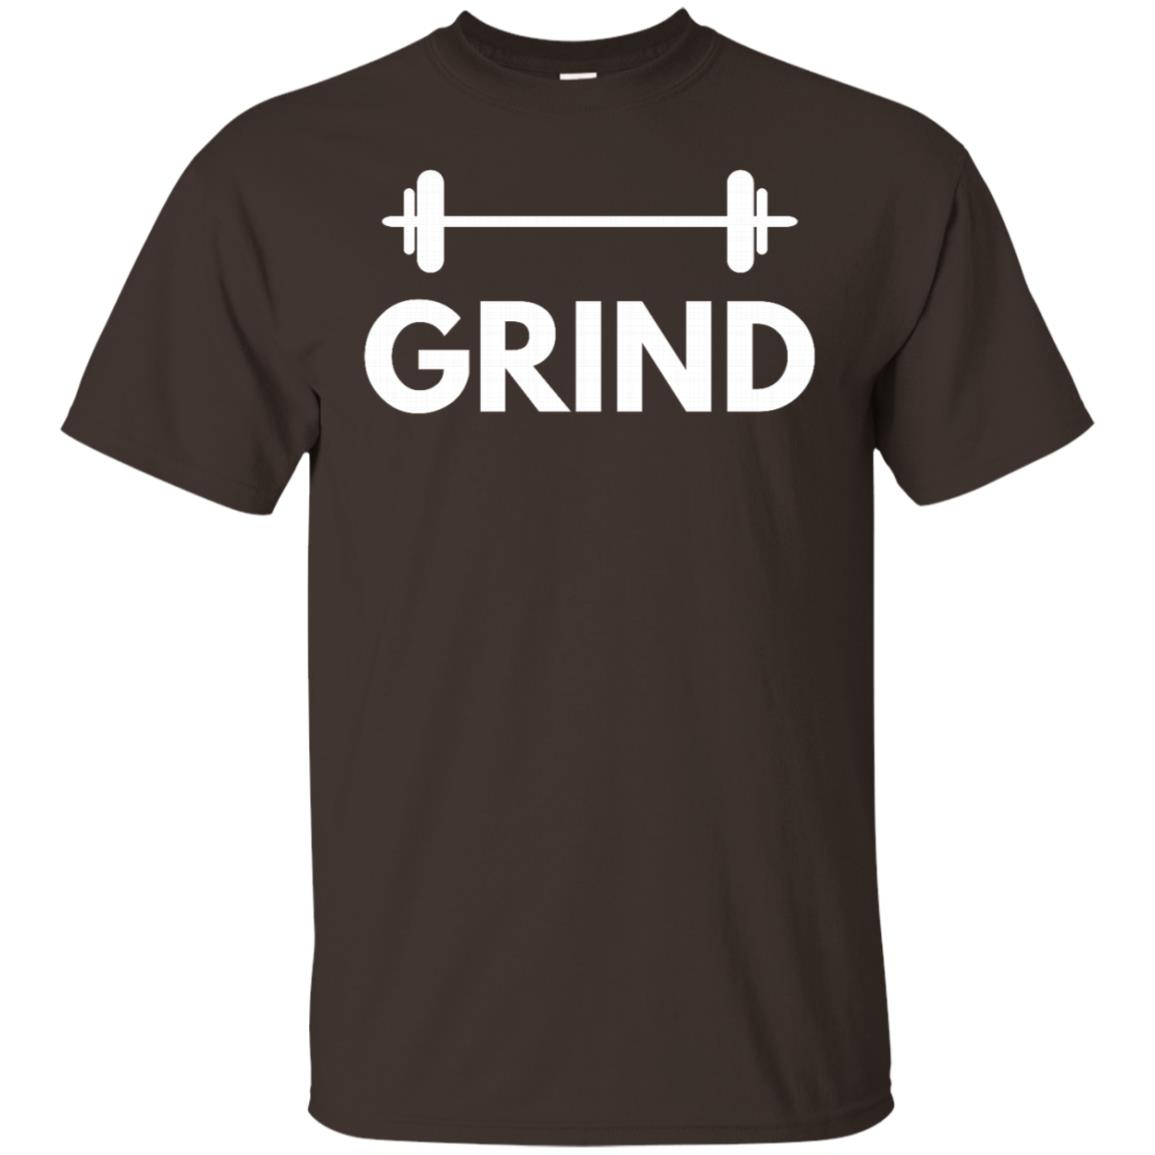 Grind Gym Workout Unisex Short Sleeve